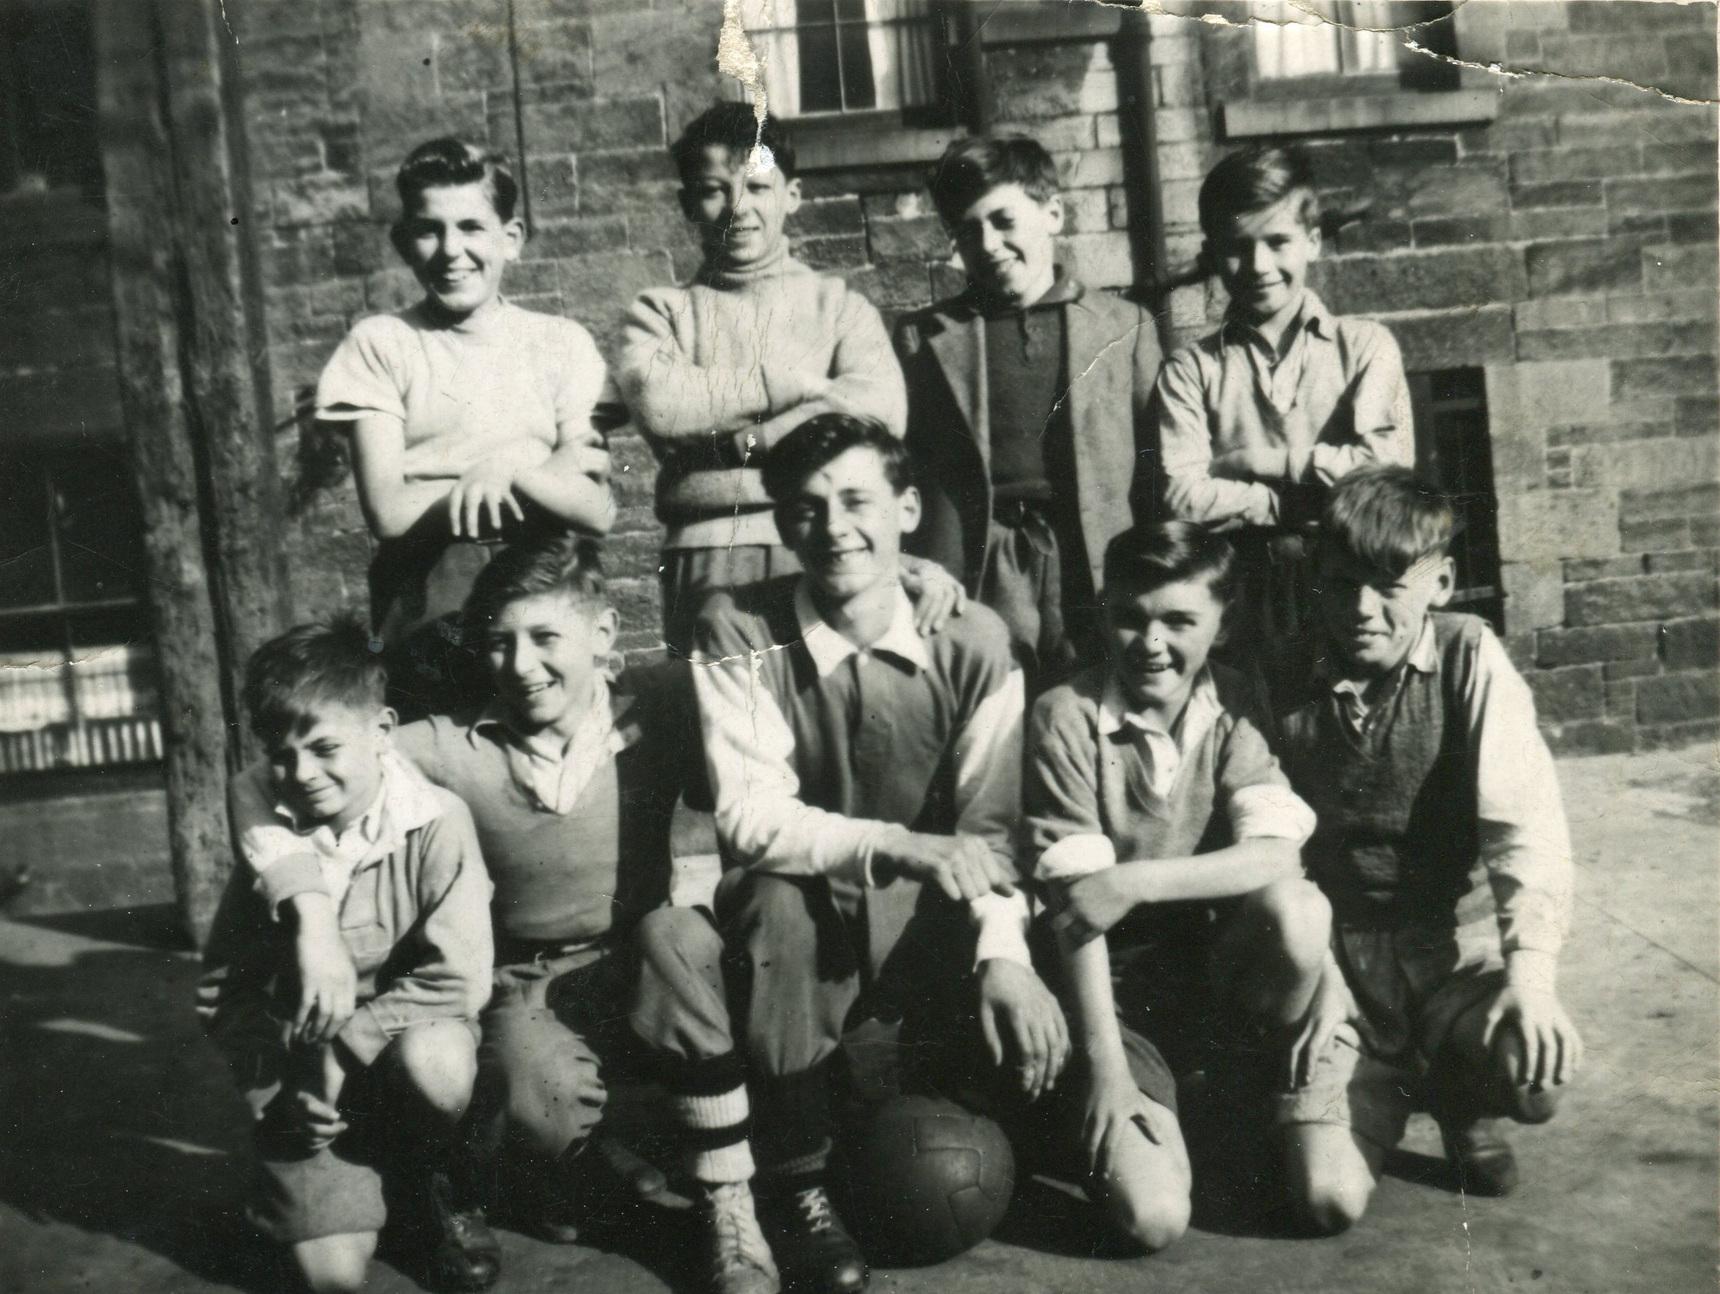 Group Of Boys Playing As Ballantyne Football Team 1950